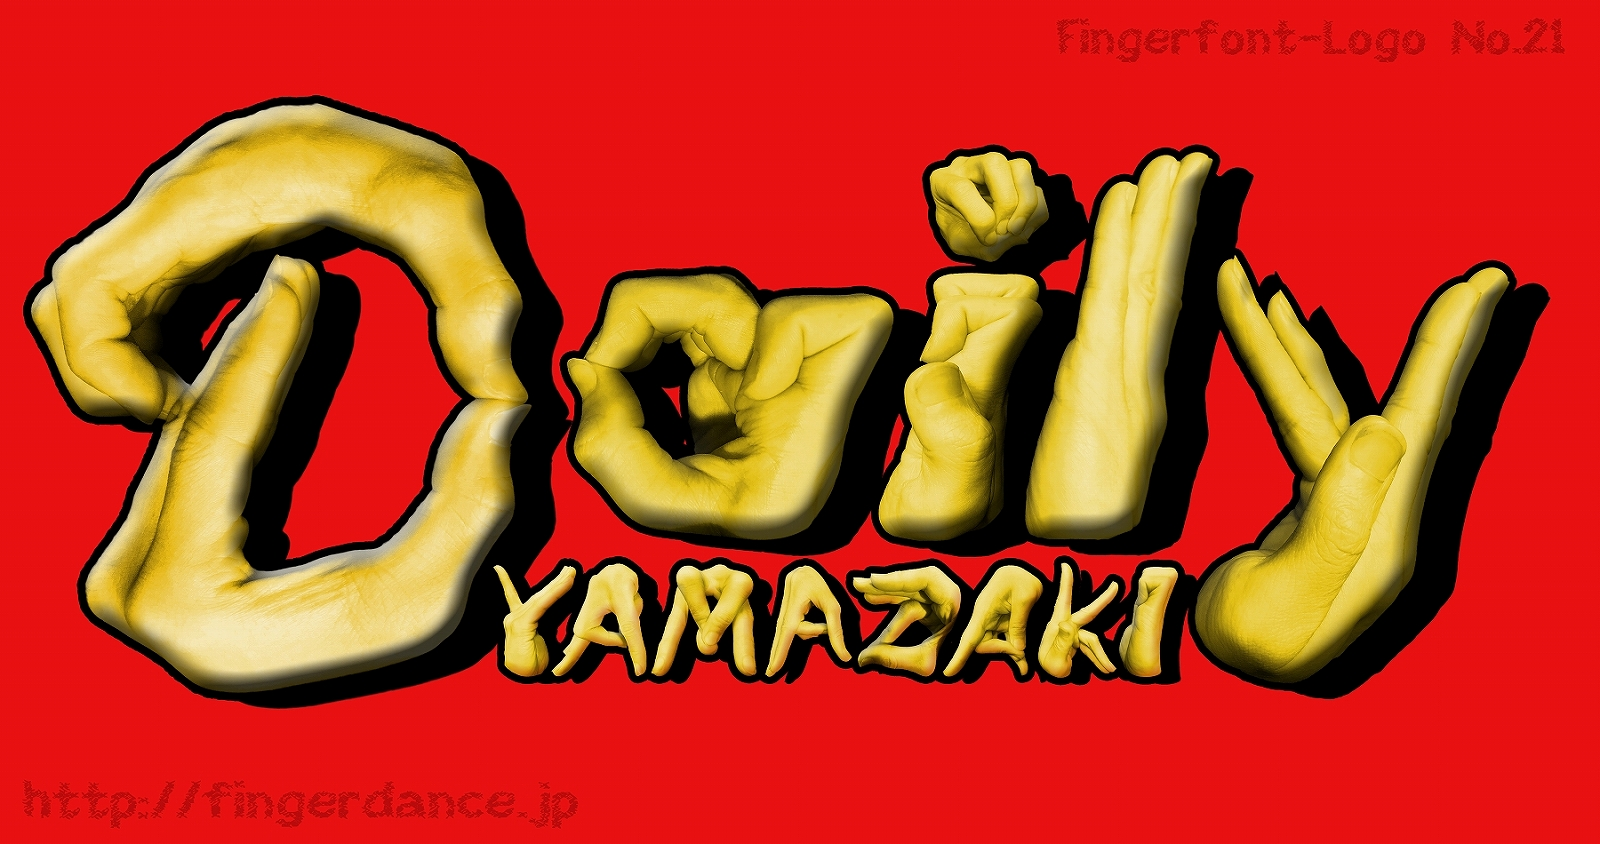 DailyYamazaki-fingerhttp://fingerdance.jp/L/logohand デイリーヤマザキフィンガーロゴハンド手指